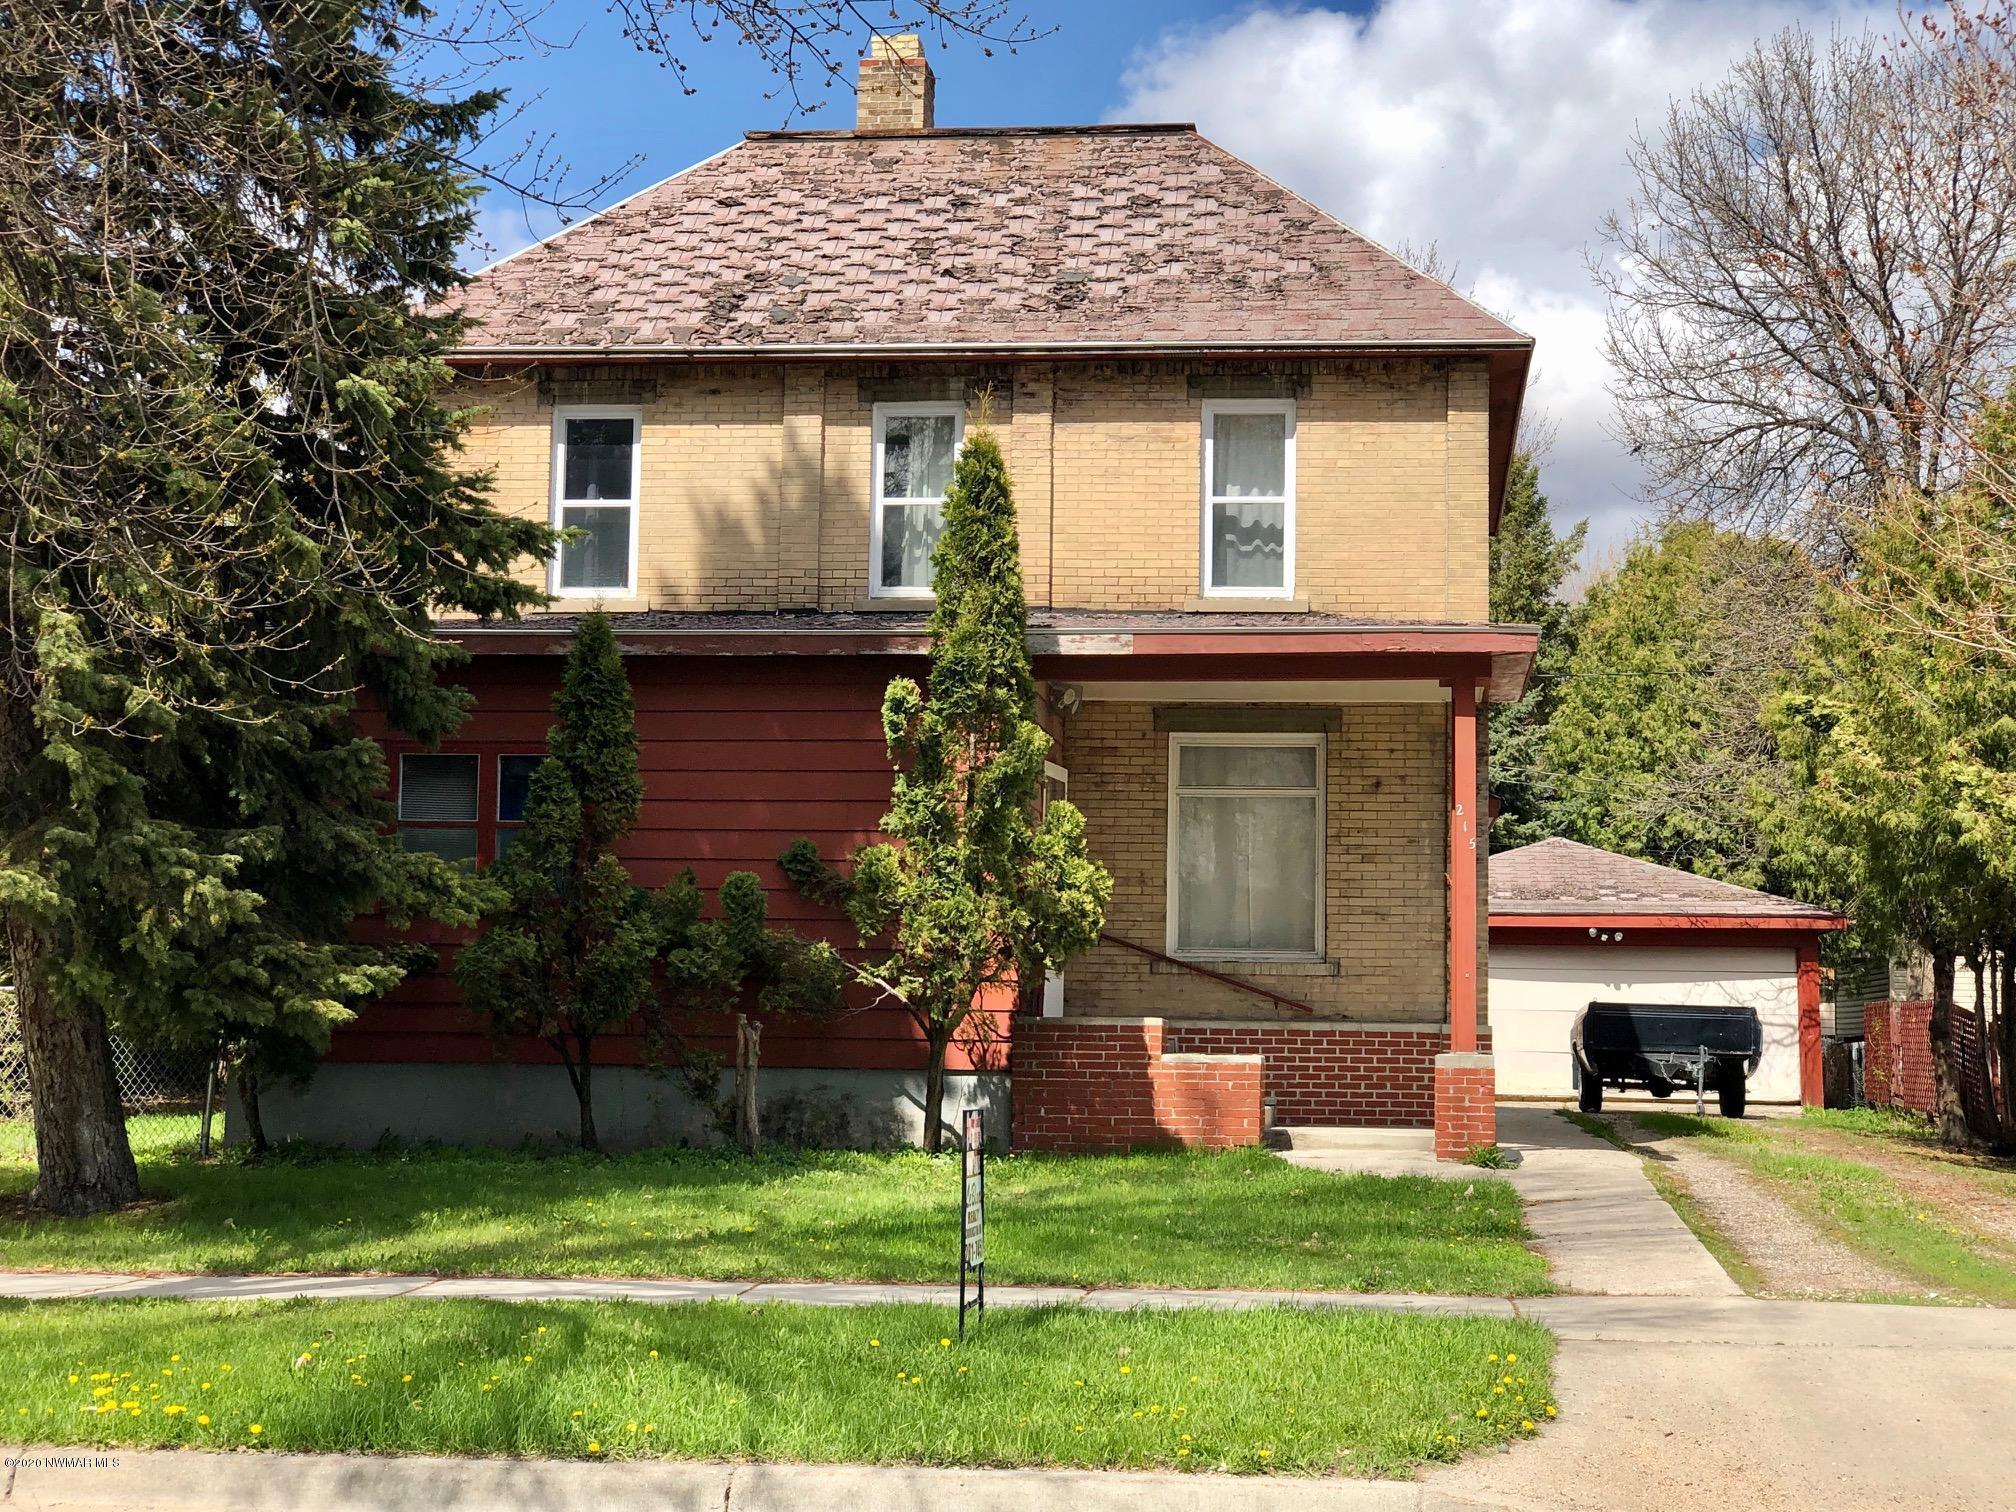 215 5th E Property Photo - Crookston, MN real estate listing